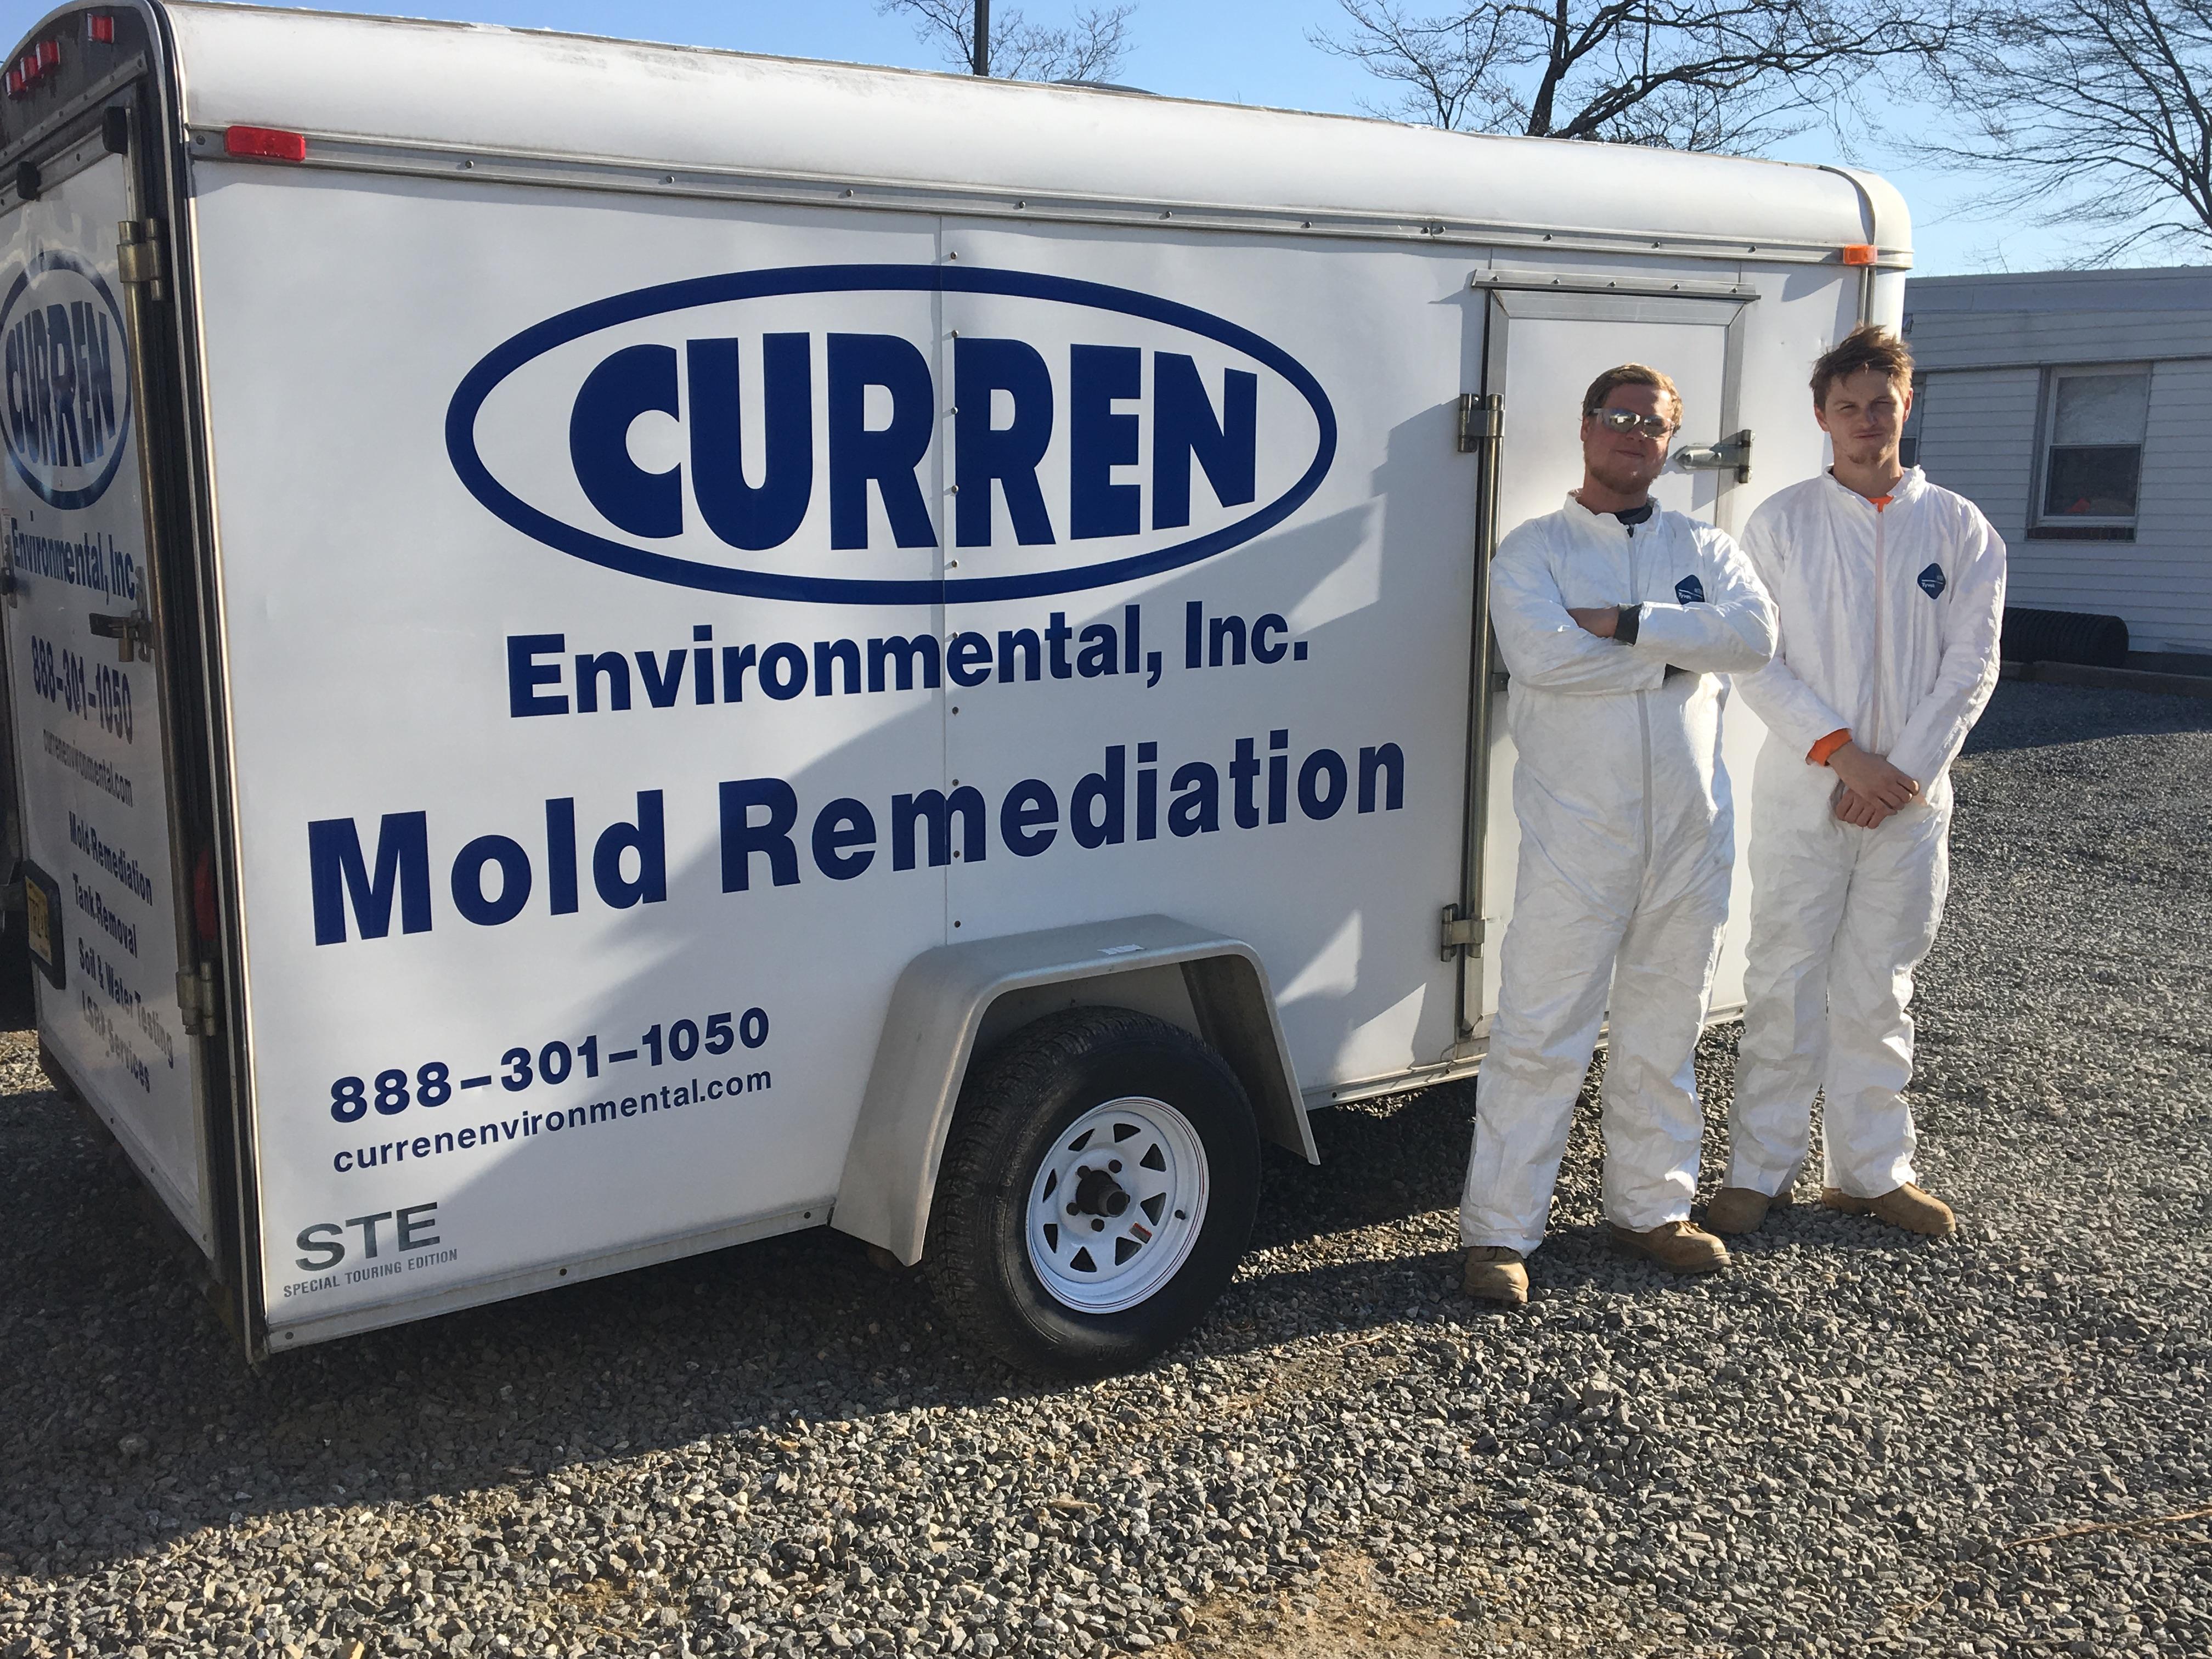 mold remedition trailer.jpg